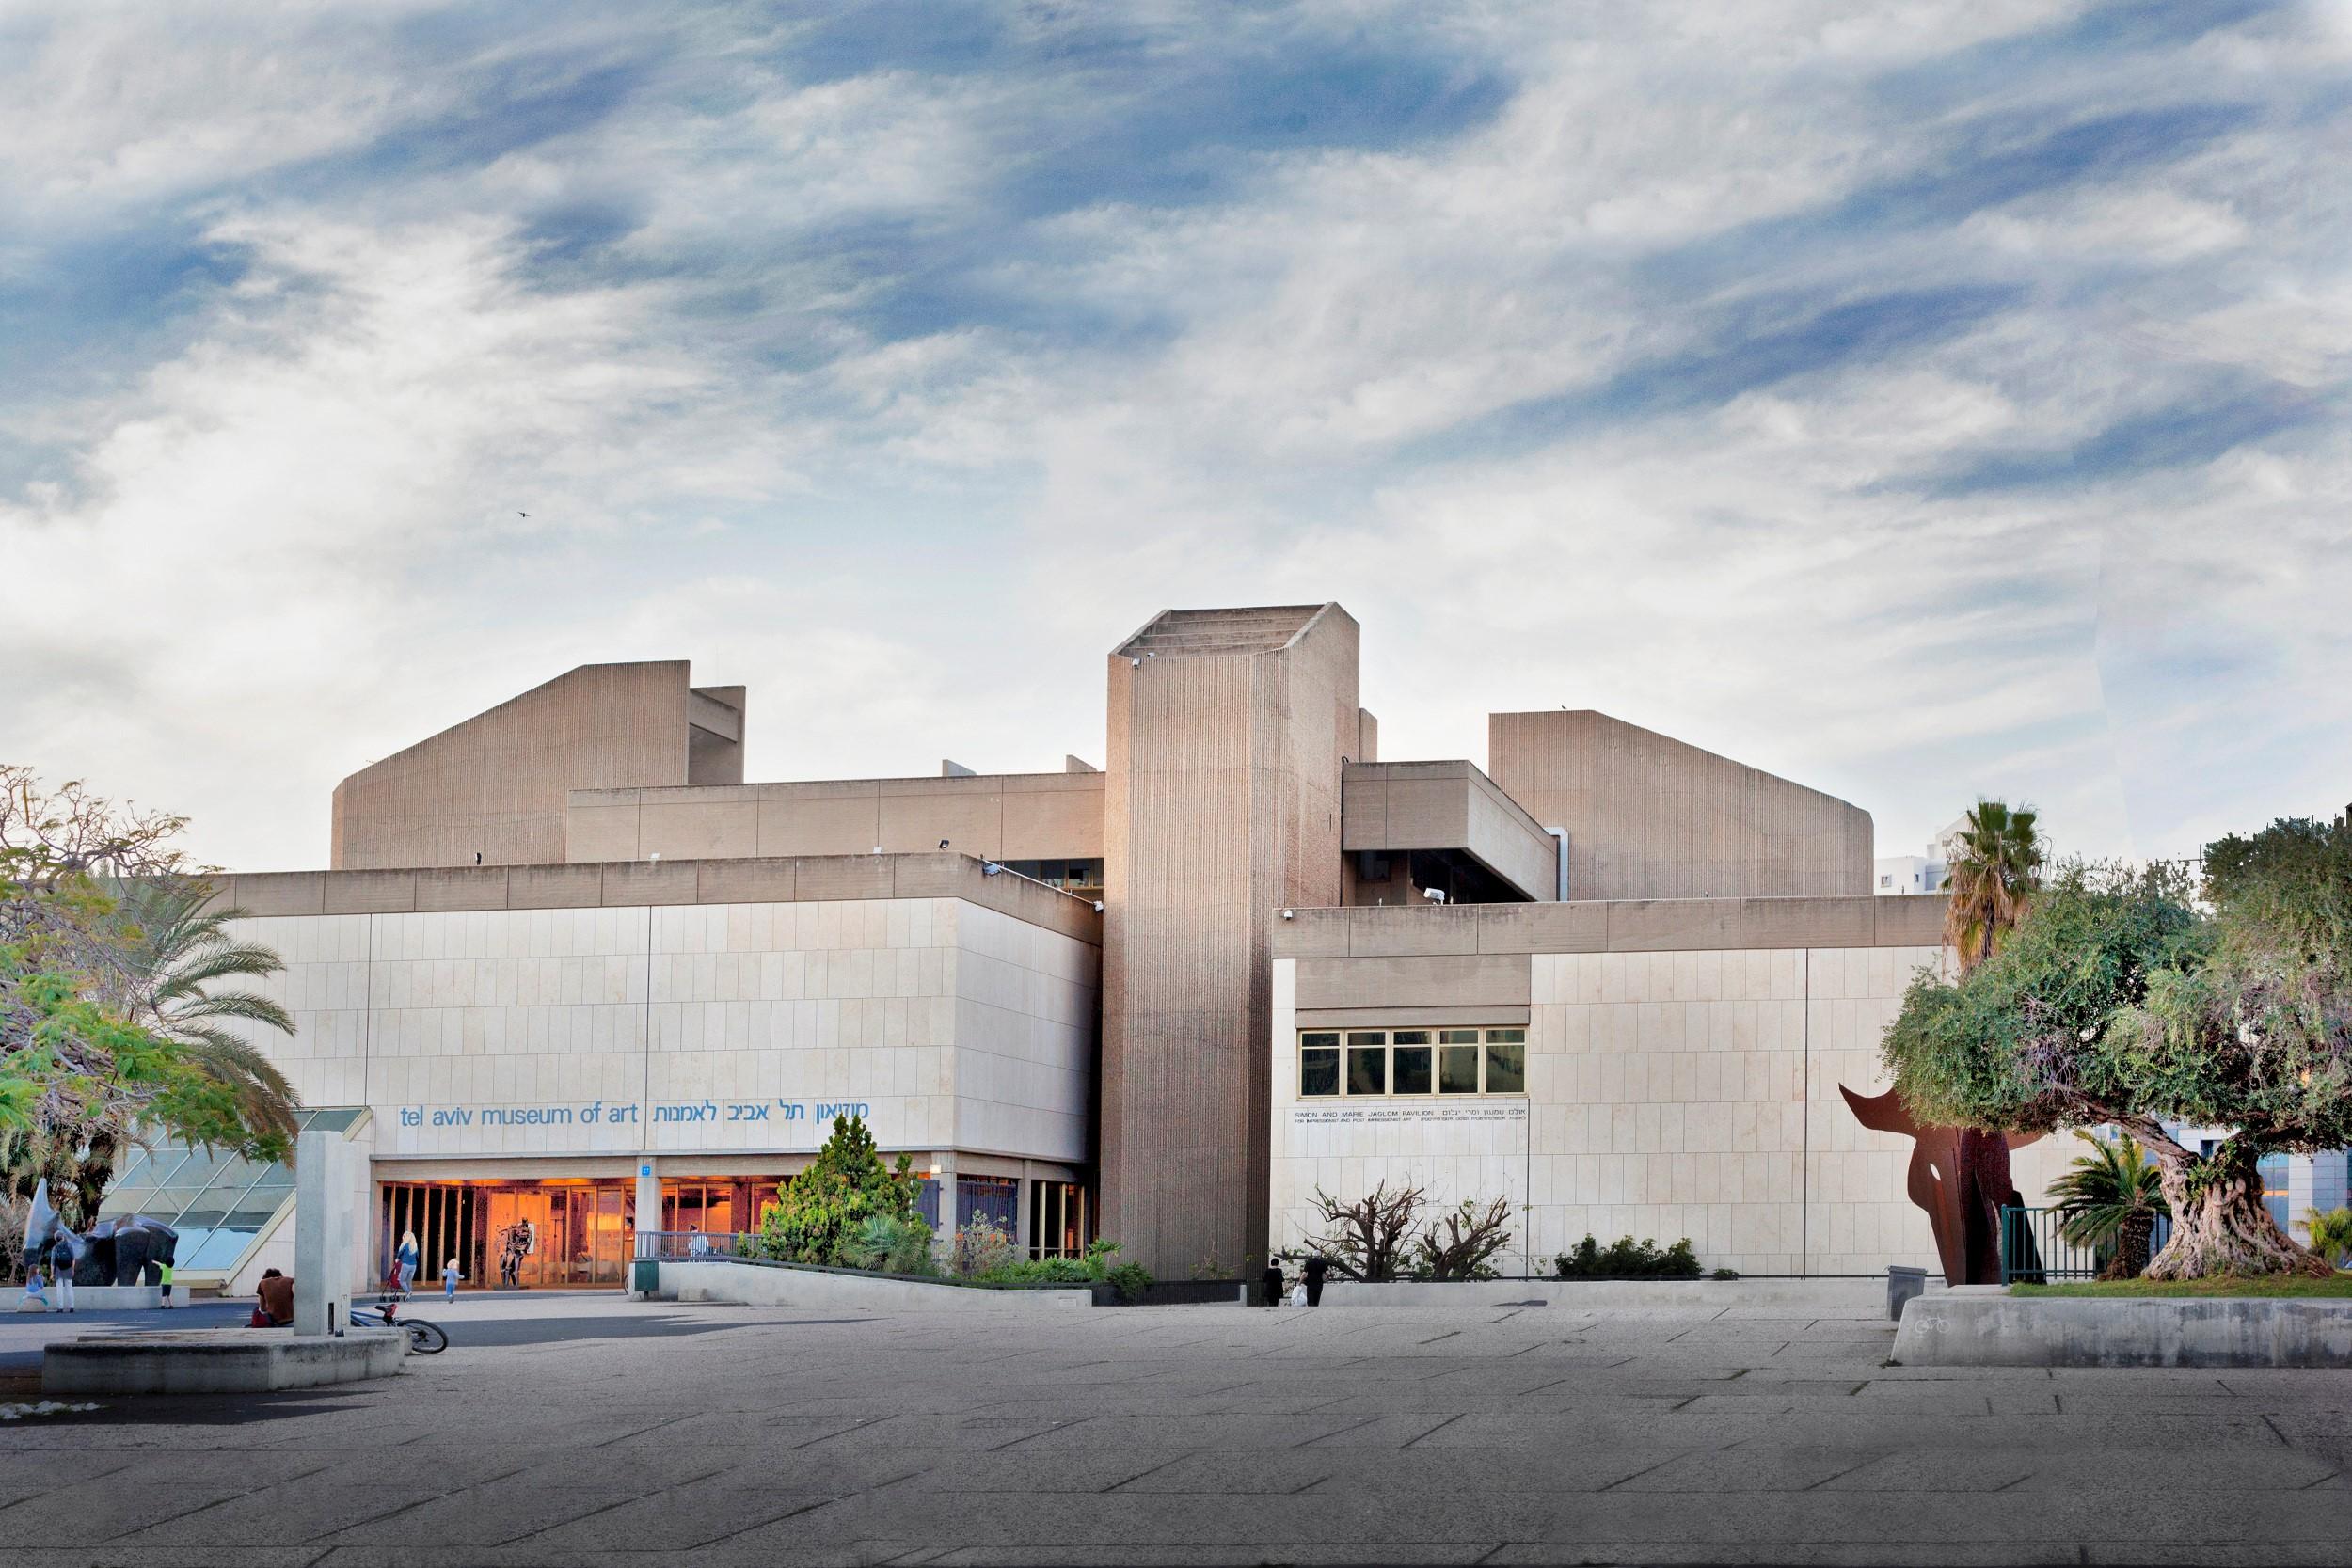 (צילום: גיל בר, מוזיאון תל-אביב, בתכנון האדריכל דן איתן)